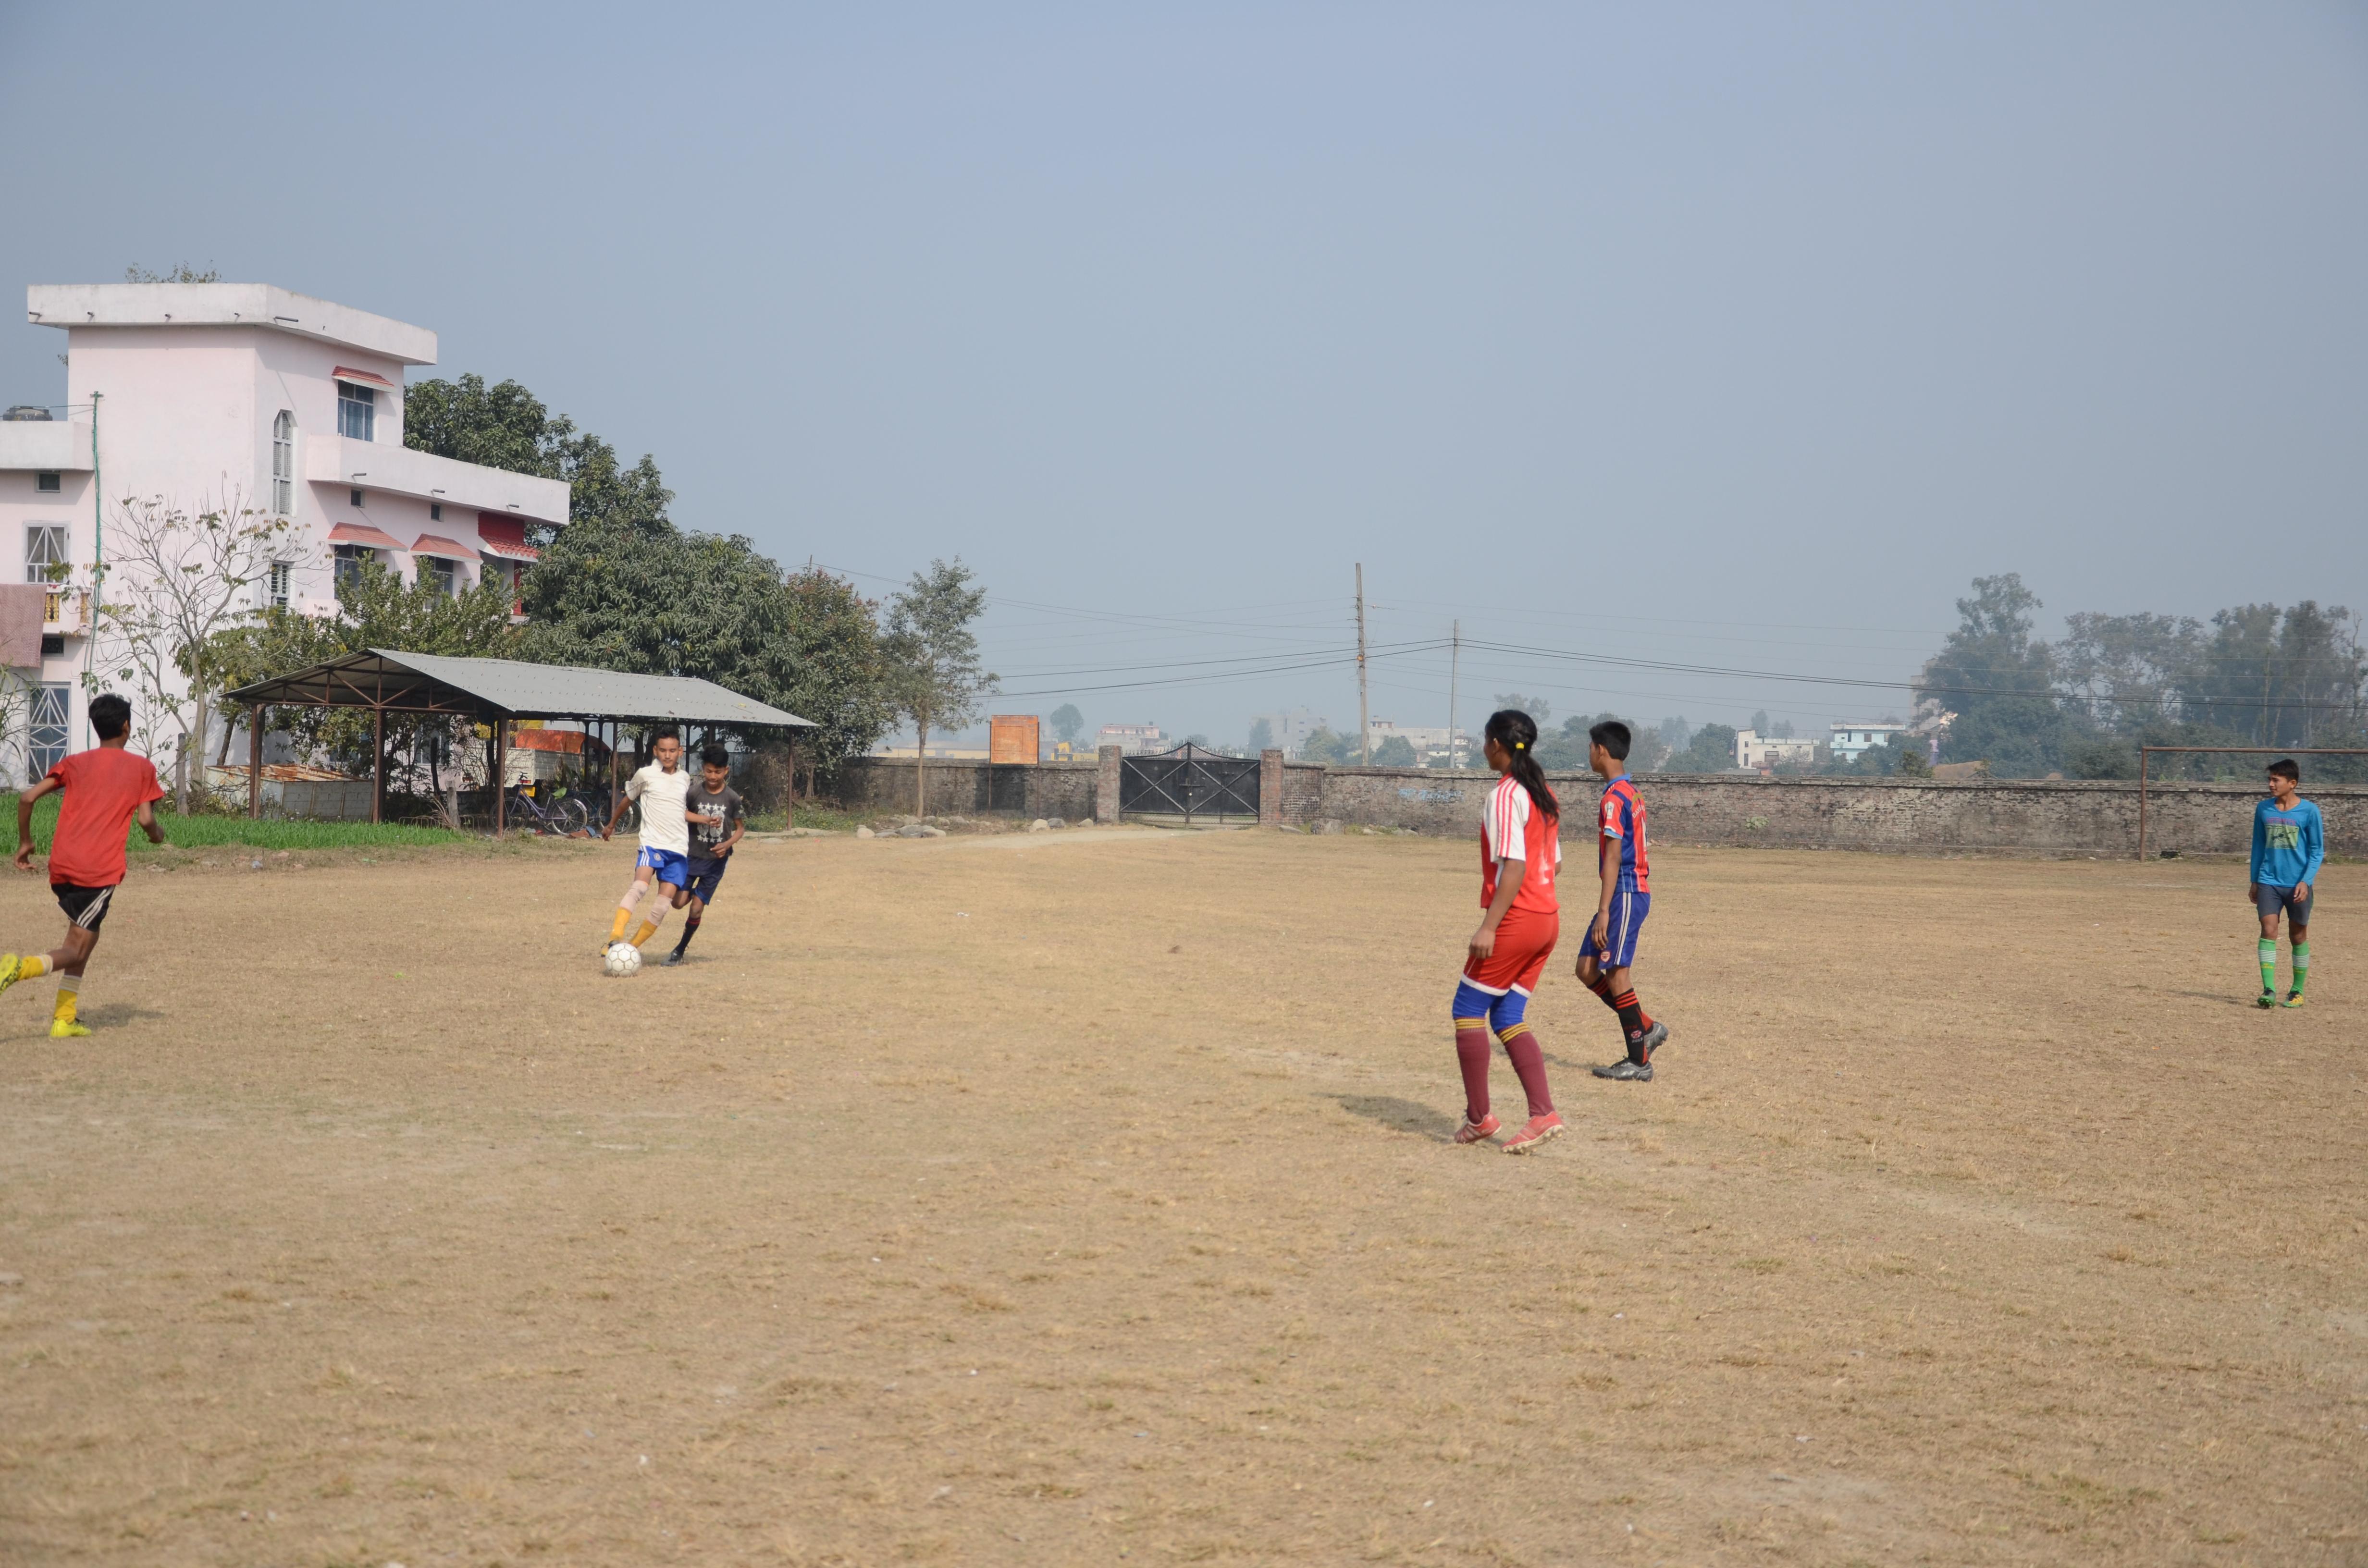 s151194_10_Sumina_Nepal_SKunwar_(7)_720373.JPG